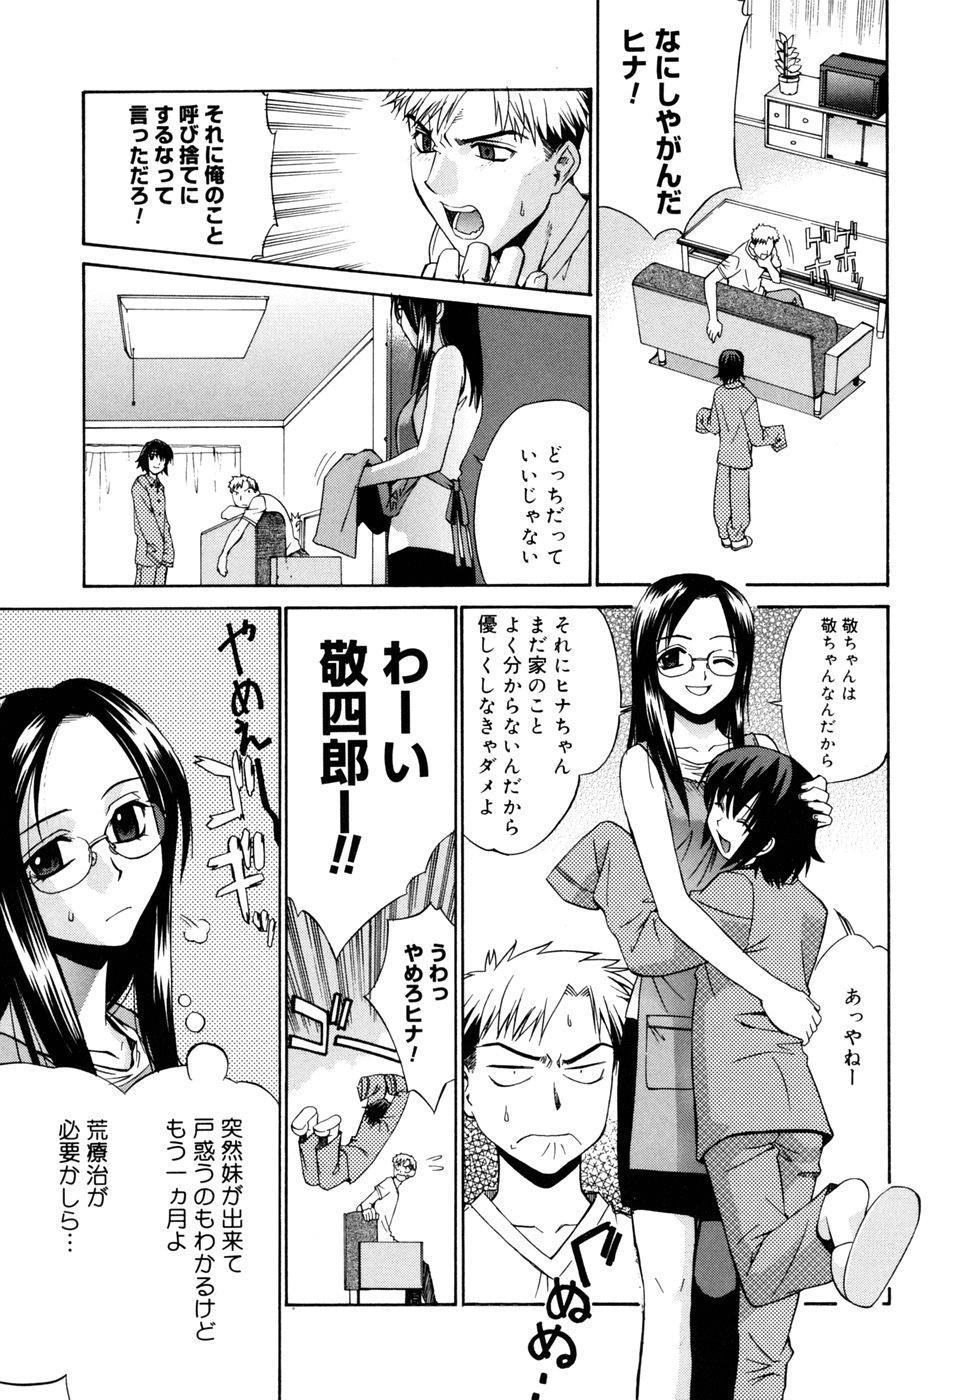 [Yaya Hinata] Tonari no Miko-san wa Minna Warau - The next shrine maidens smile in everyone. 202